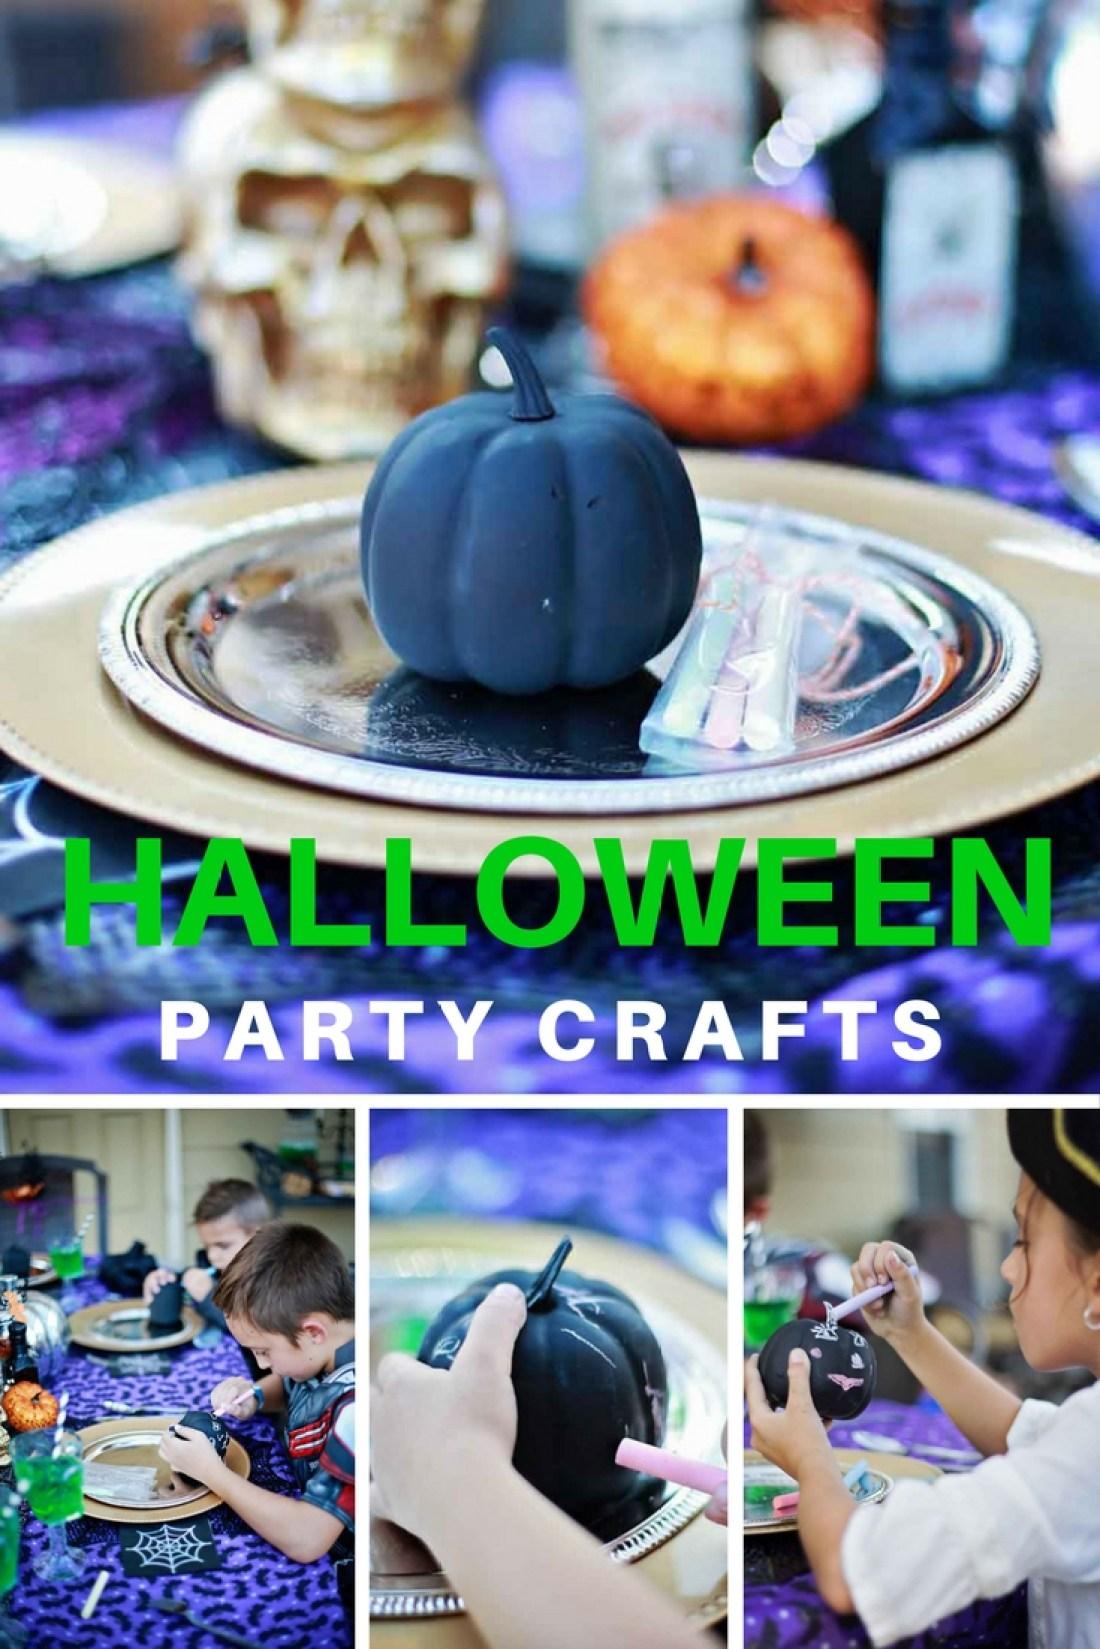 Halloween Party crafts including Chalk Paint Jack-o-lanterns, or CHalk-O-lanterns!